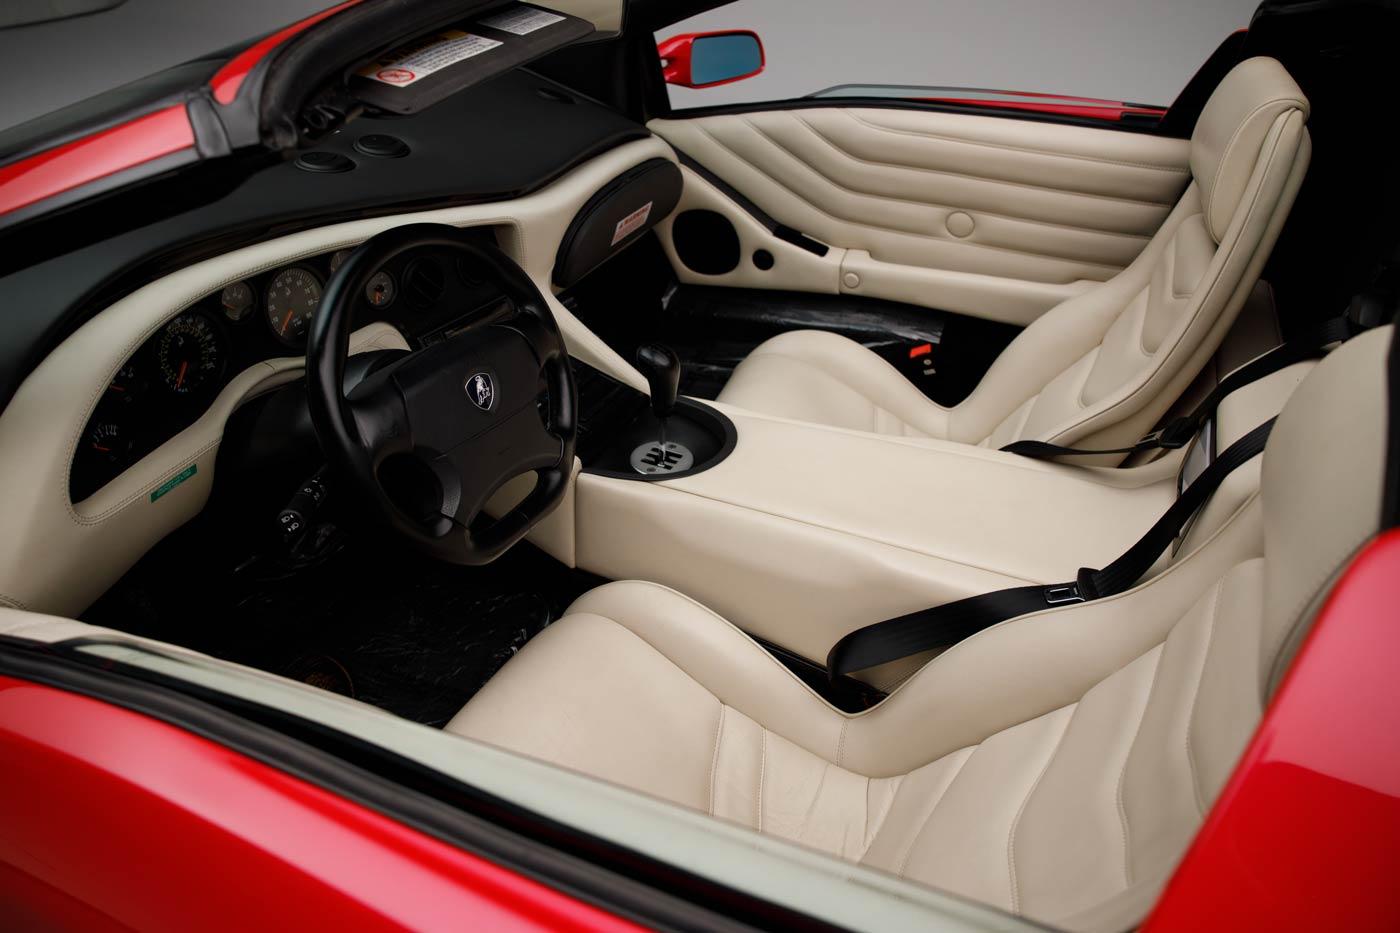 1999 Lamborghini Diablo - The JBS Collection